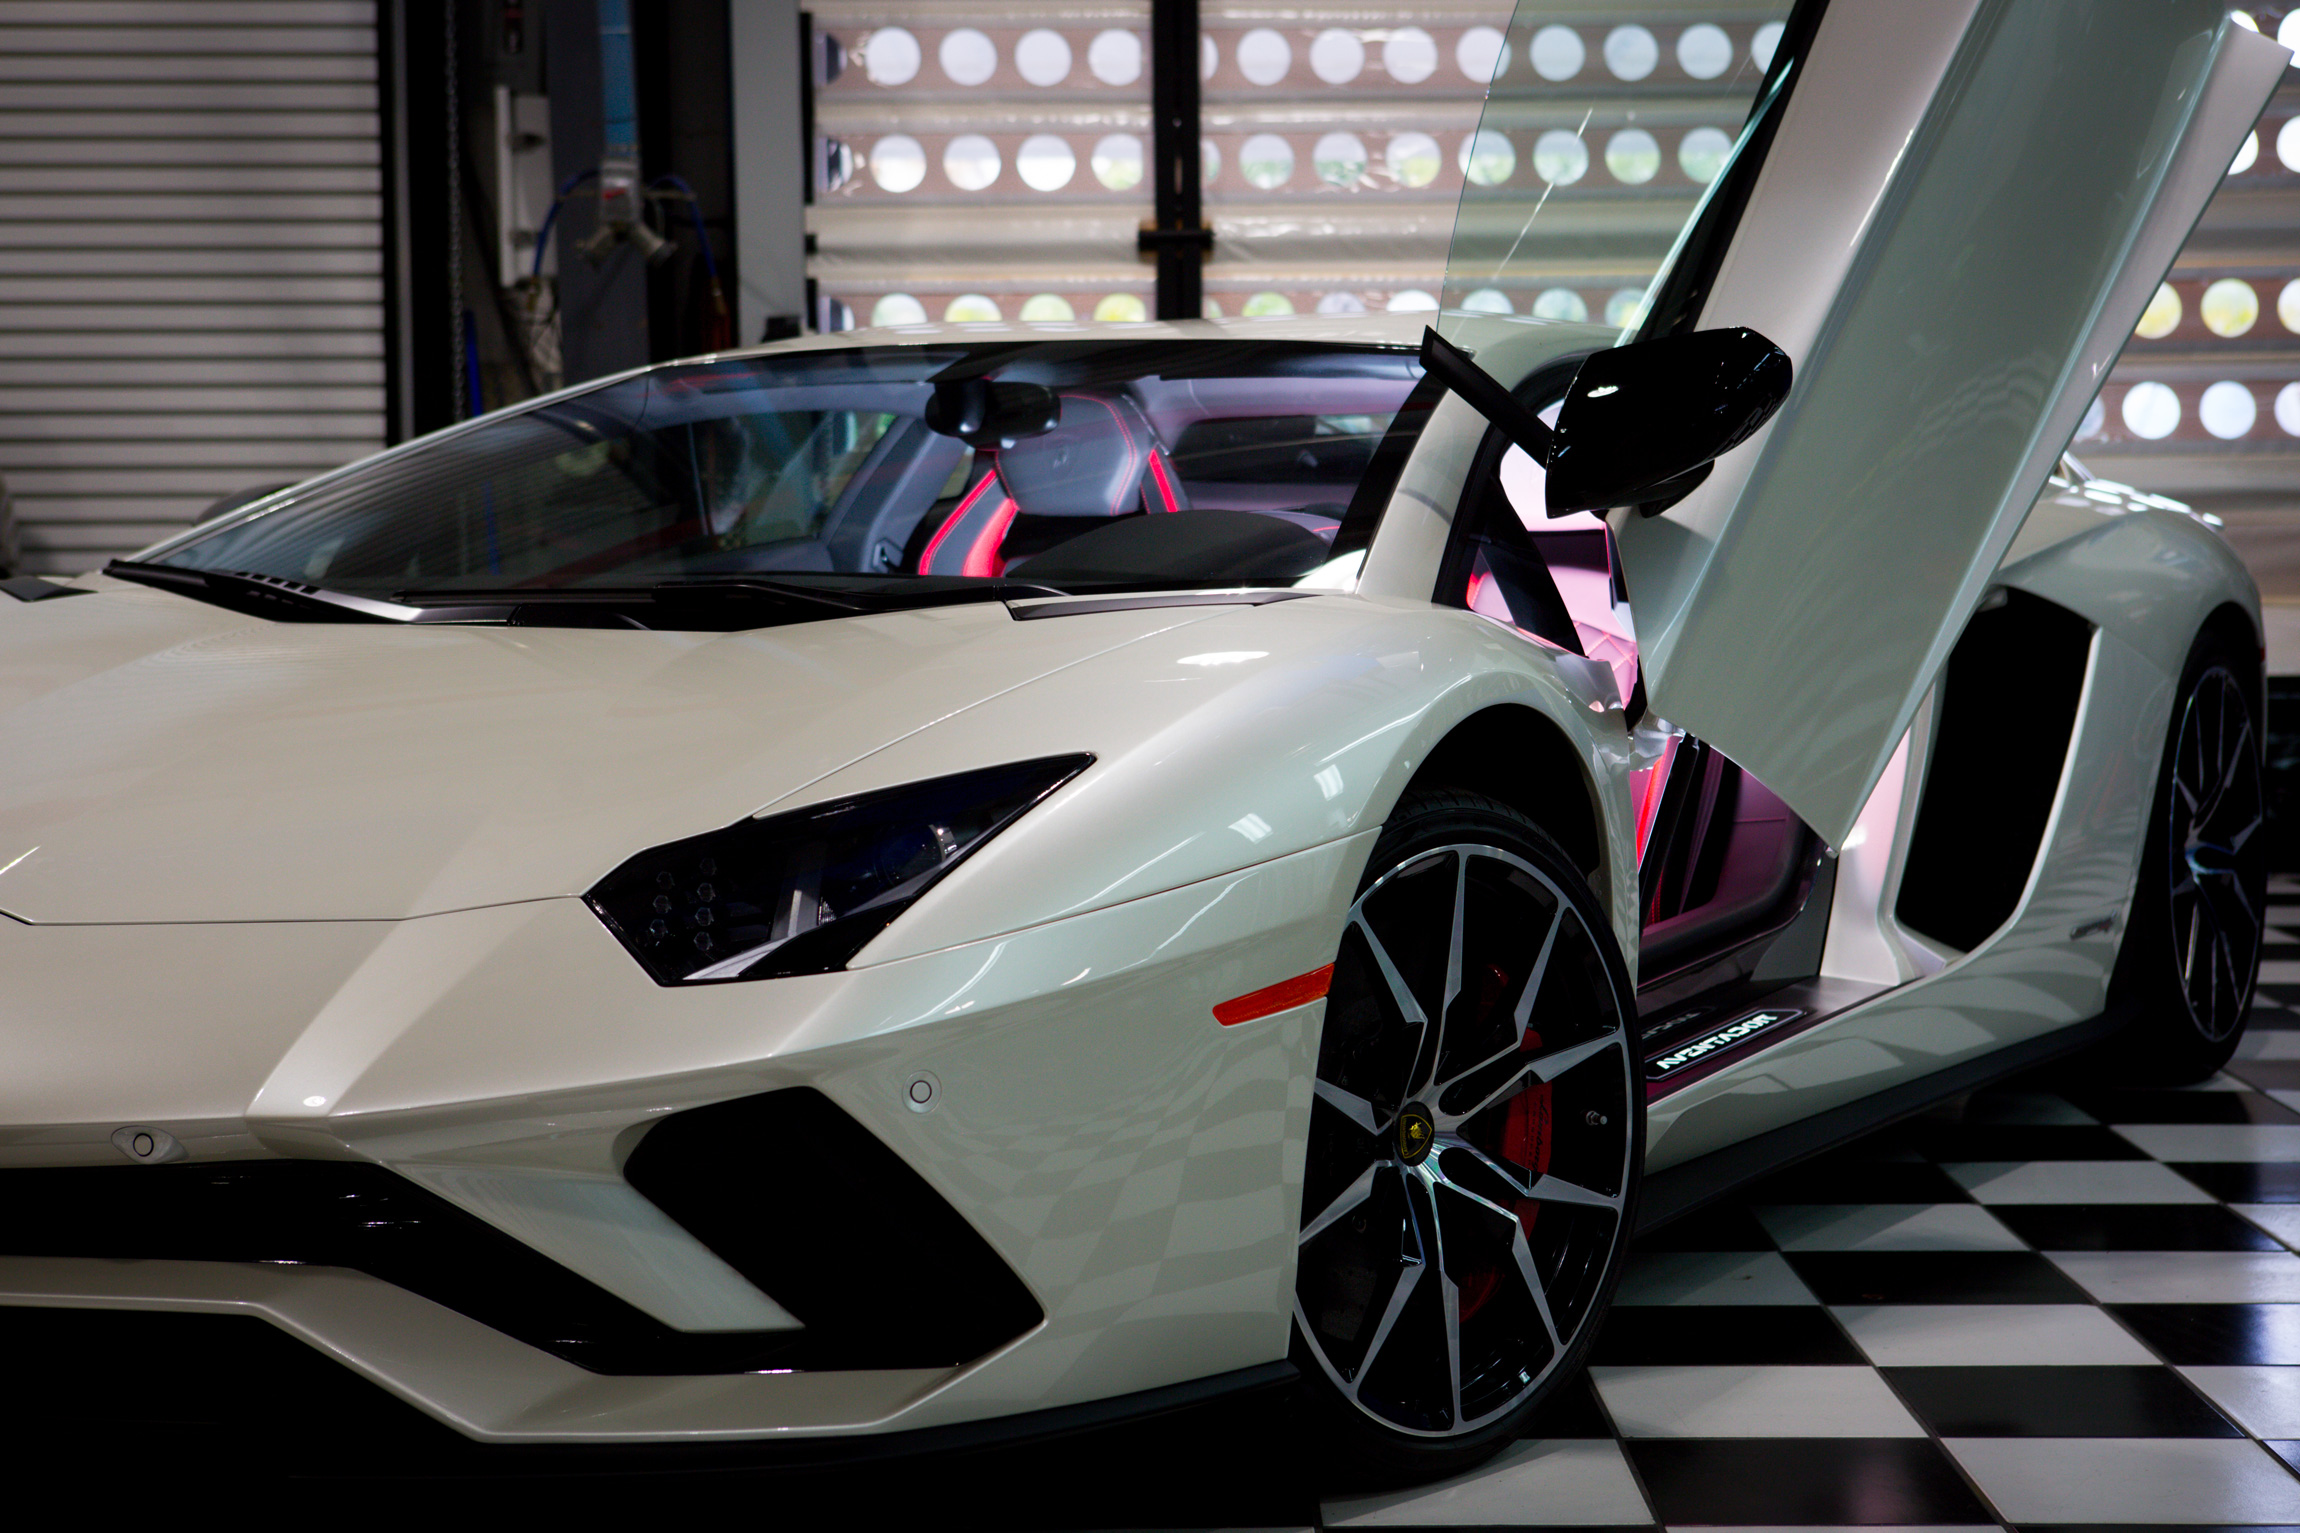 2017 Lamborghini Aventador S – Fantastic Finishes on land rover defender on rims, nissan leaf on rims, eagle talon on rims, hyundai veloster on rims, mini countryman on rims, mercedes-benz g-class on rims, toyota sienna on rims, rolls-royce ghost on rims, pontiac firebird on rims, chevrolet camaro on rims, audi r8 on rims, ford super duty on rims, volkswagen phaeton on rims, land rover freelander on rims, srt viper on rims, volvo xc60 on rims, honda s2000 on rims, nissan gt-r on rims, maserati grancabrio on rims, lexus lfa on rims,